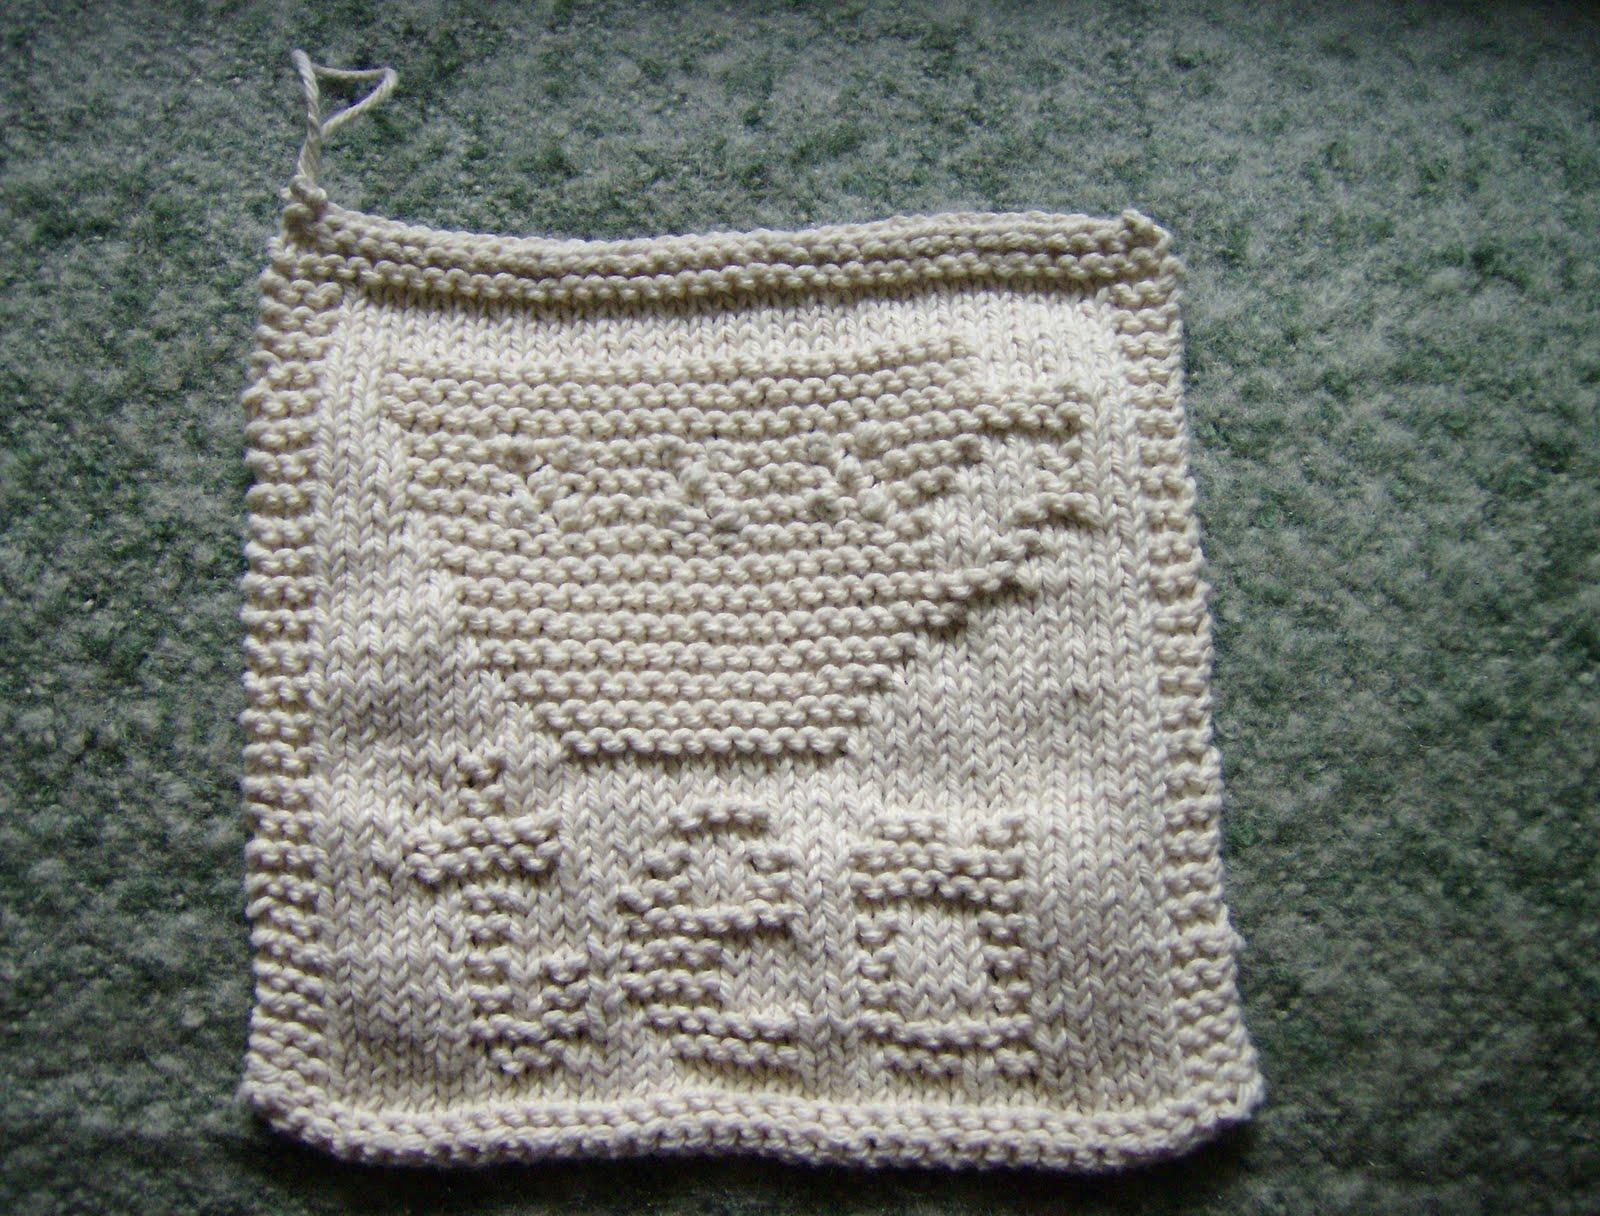 Knitting Pattern For Headbands : Knitting Knitwit: First Mini Bobble Attempt